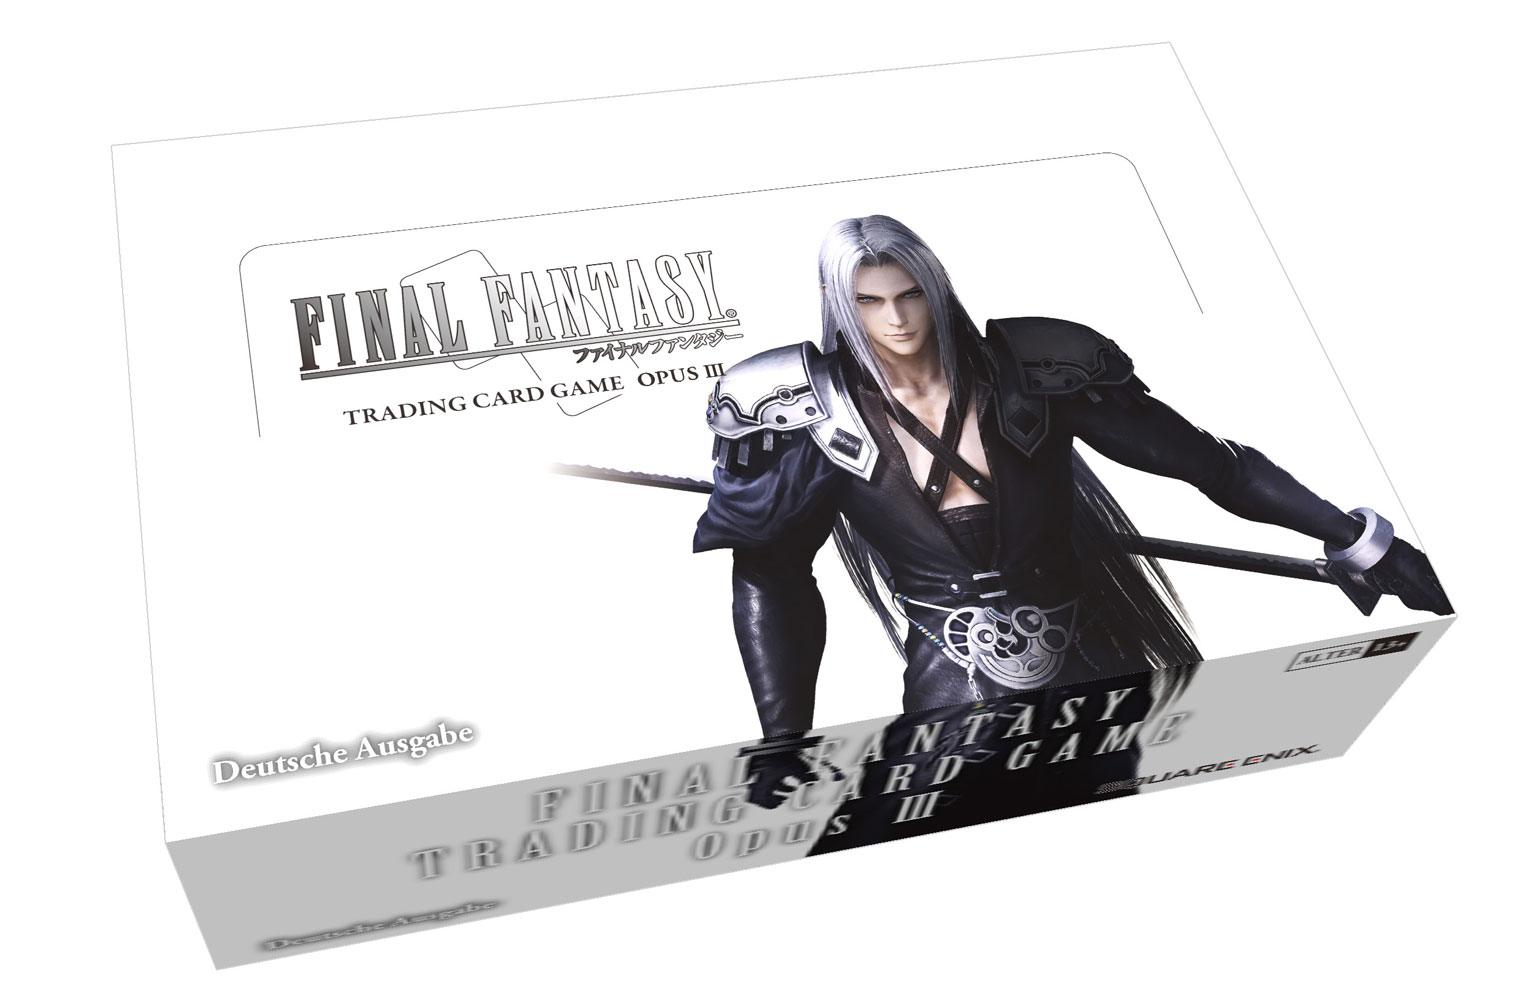 Final Fantasy TCG Opus III Booster Display (36) *German Version*